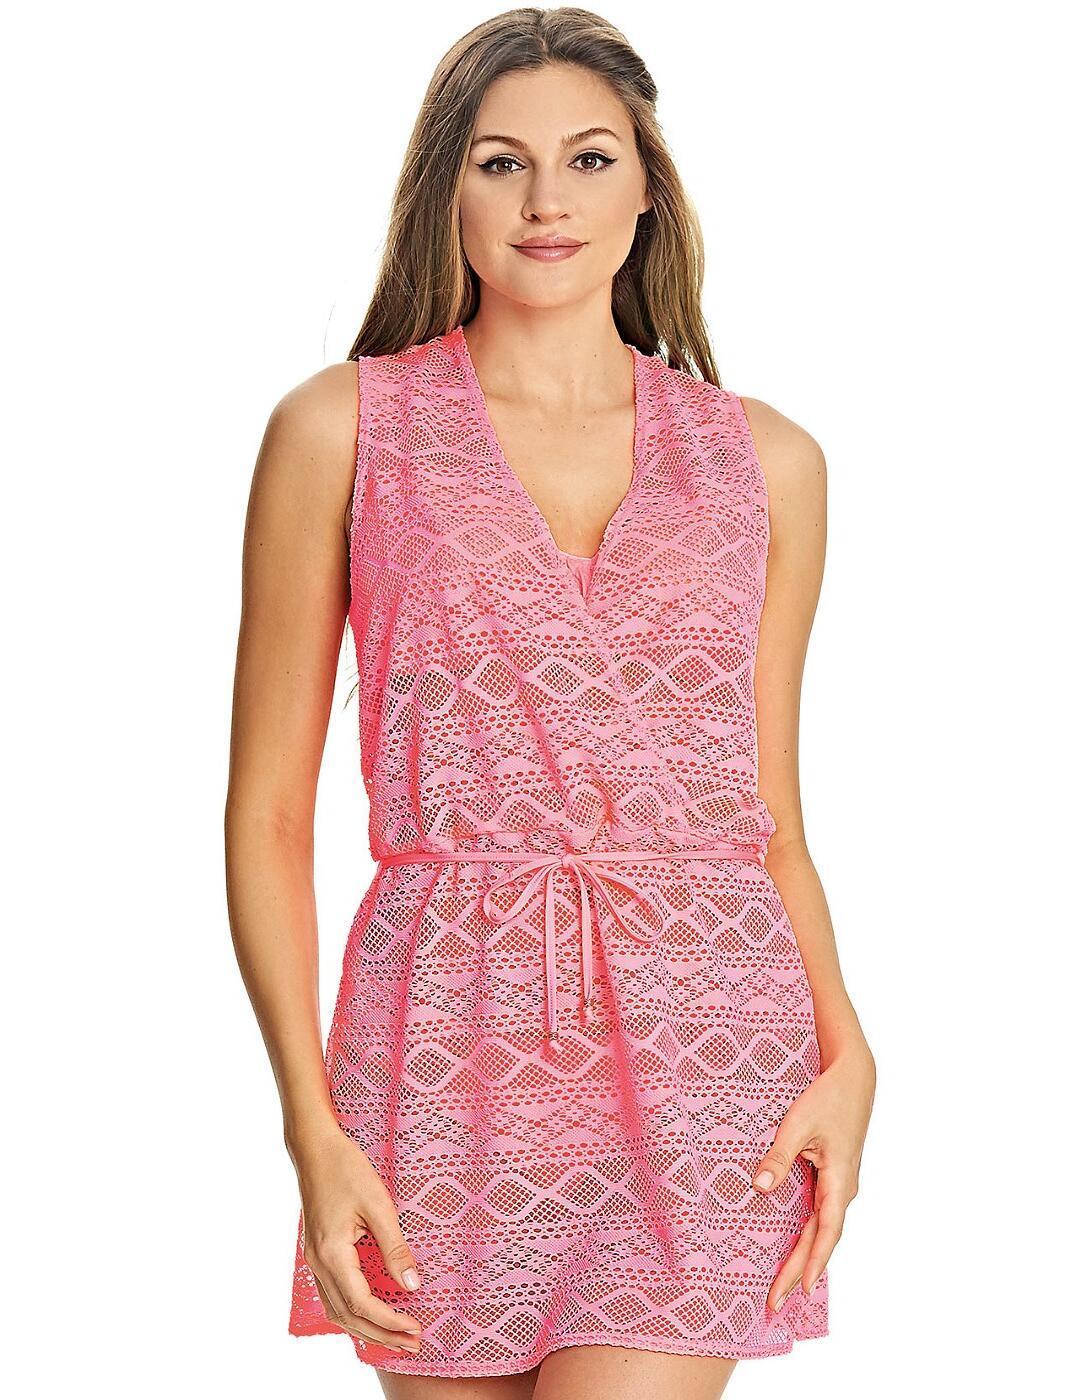 3978 Freya Sundance Cross Over Beach Dress  - 3978 Flamingo